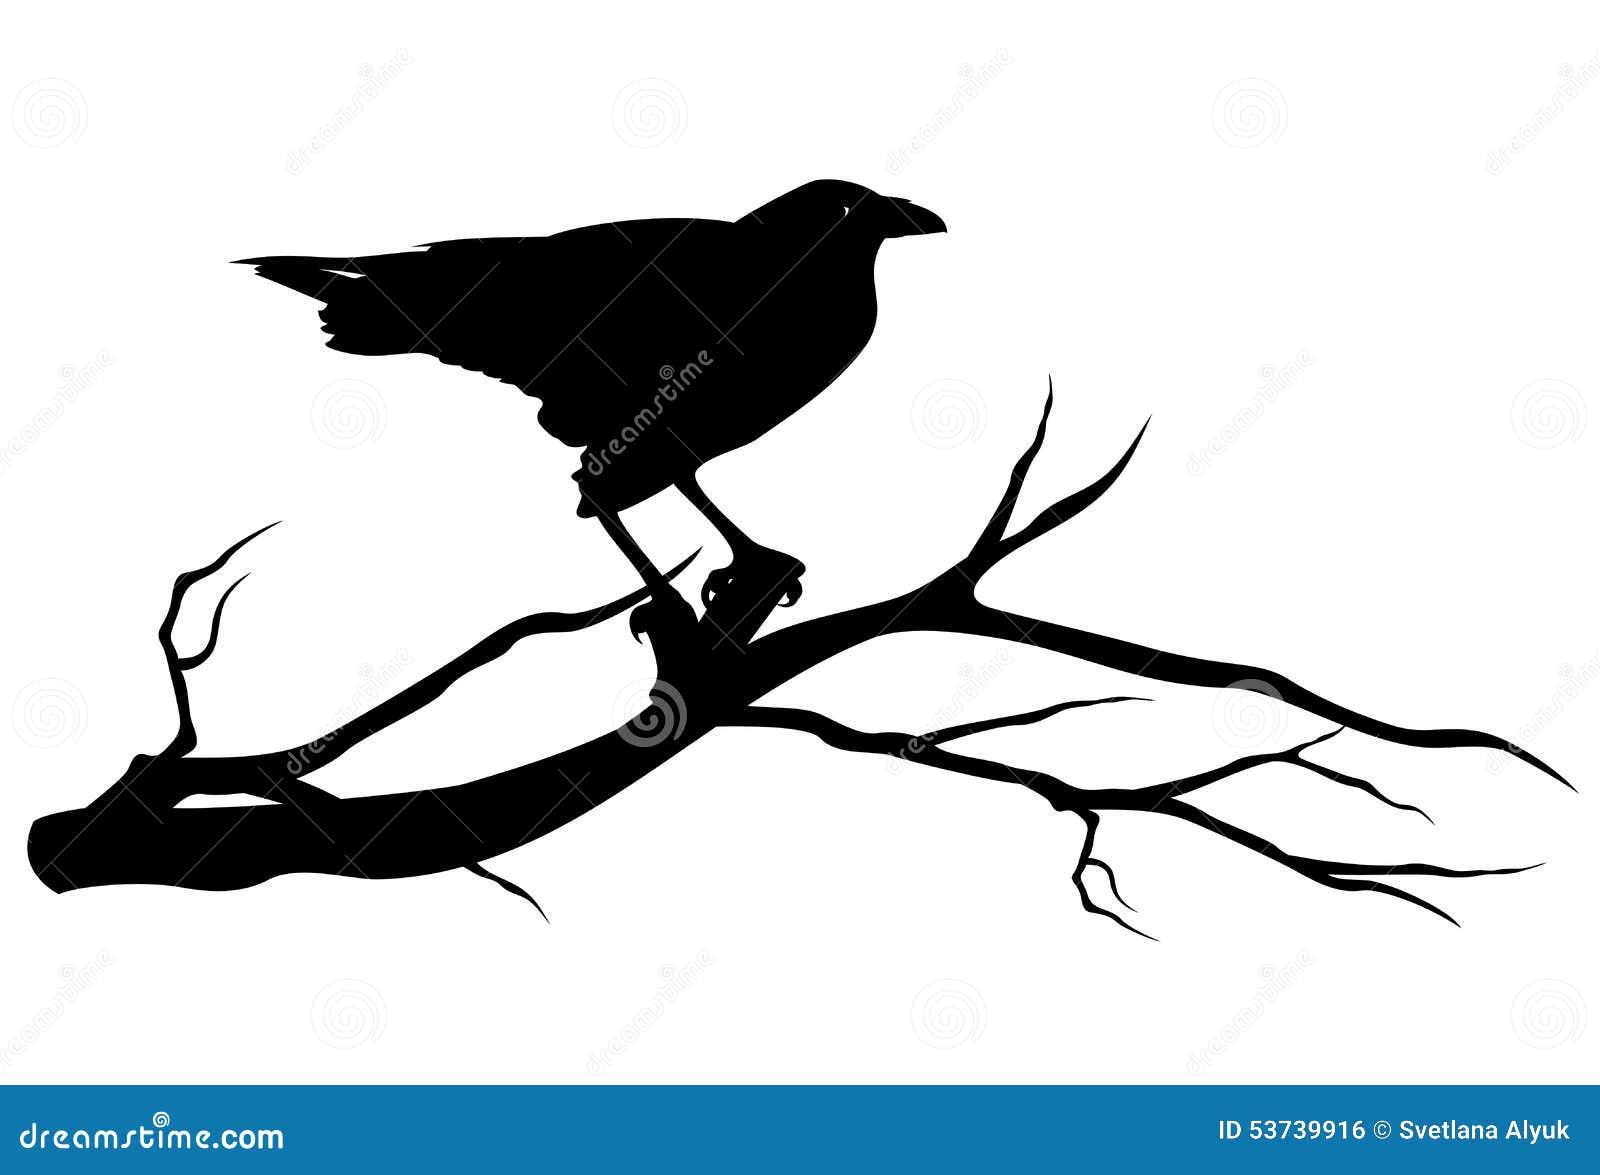 Raven bird on tree branch - black vector silhouette on white.